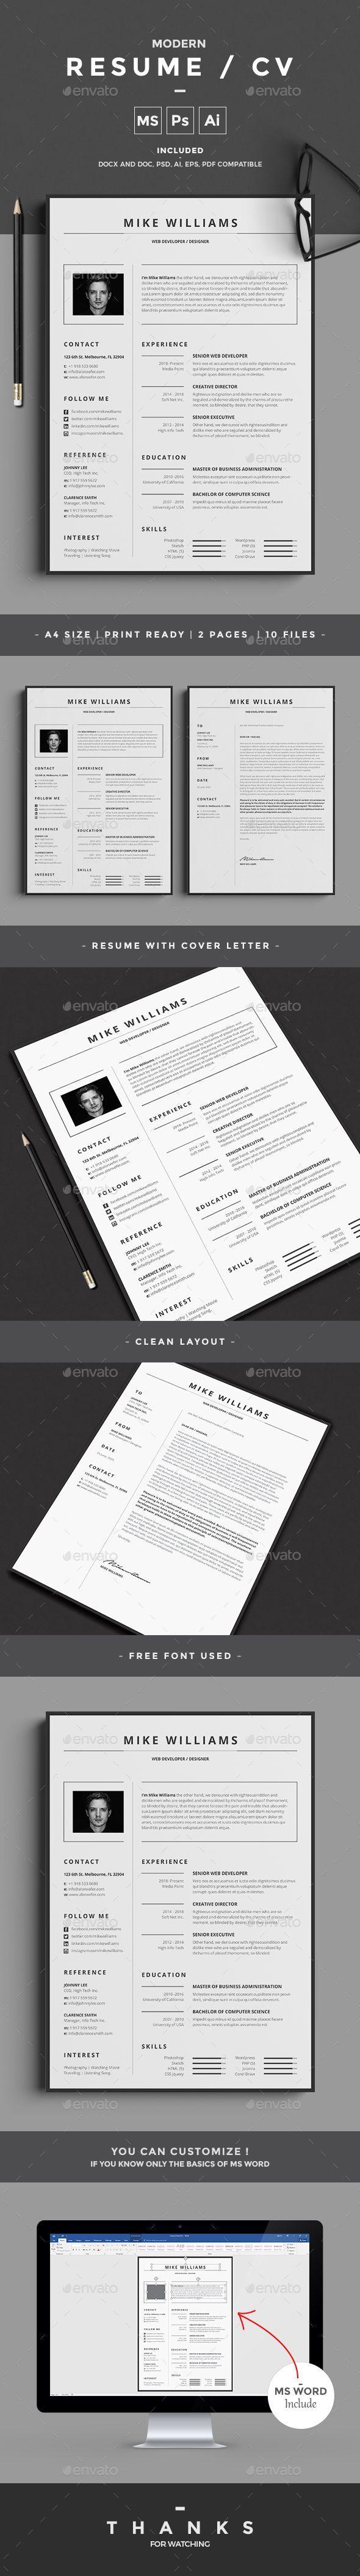 Professional Resume Template Bundle CV Package